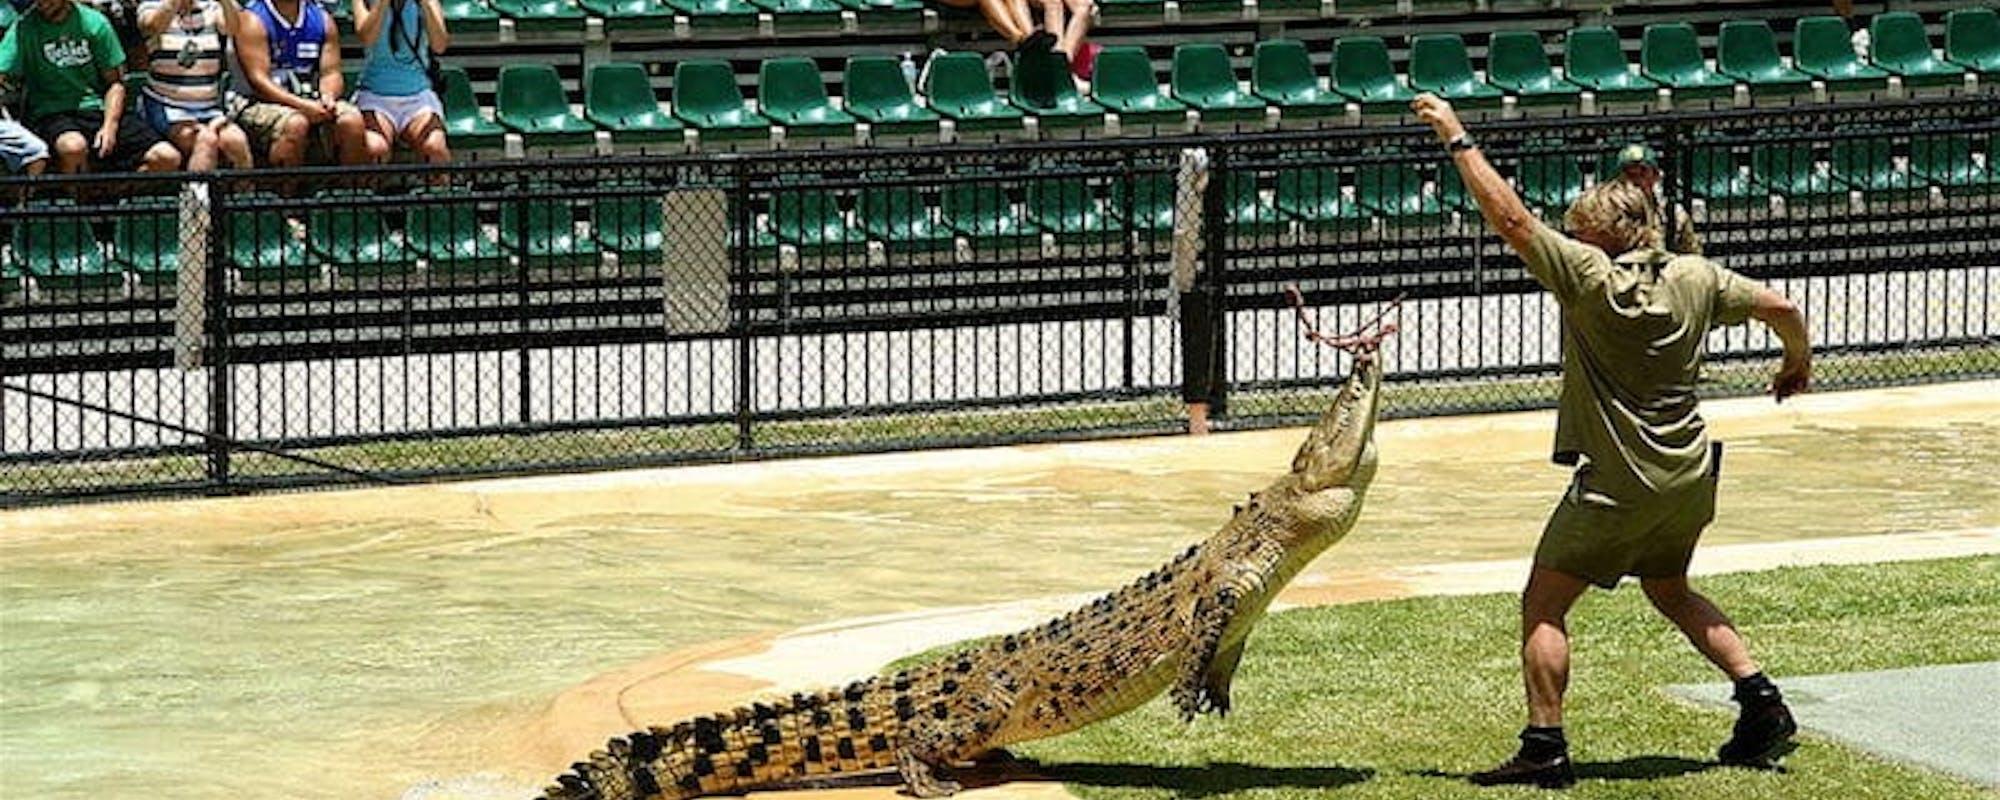 australia zoo brisbane attractions